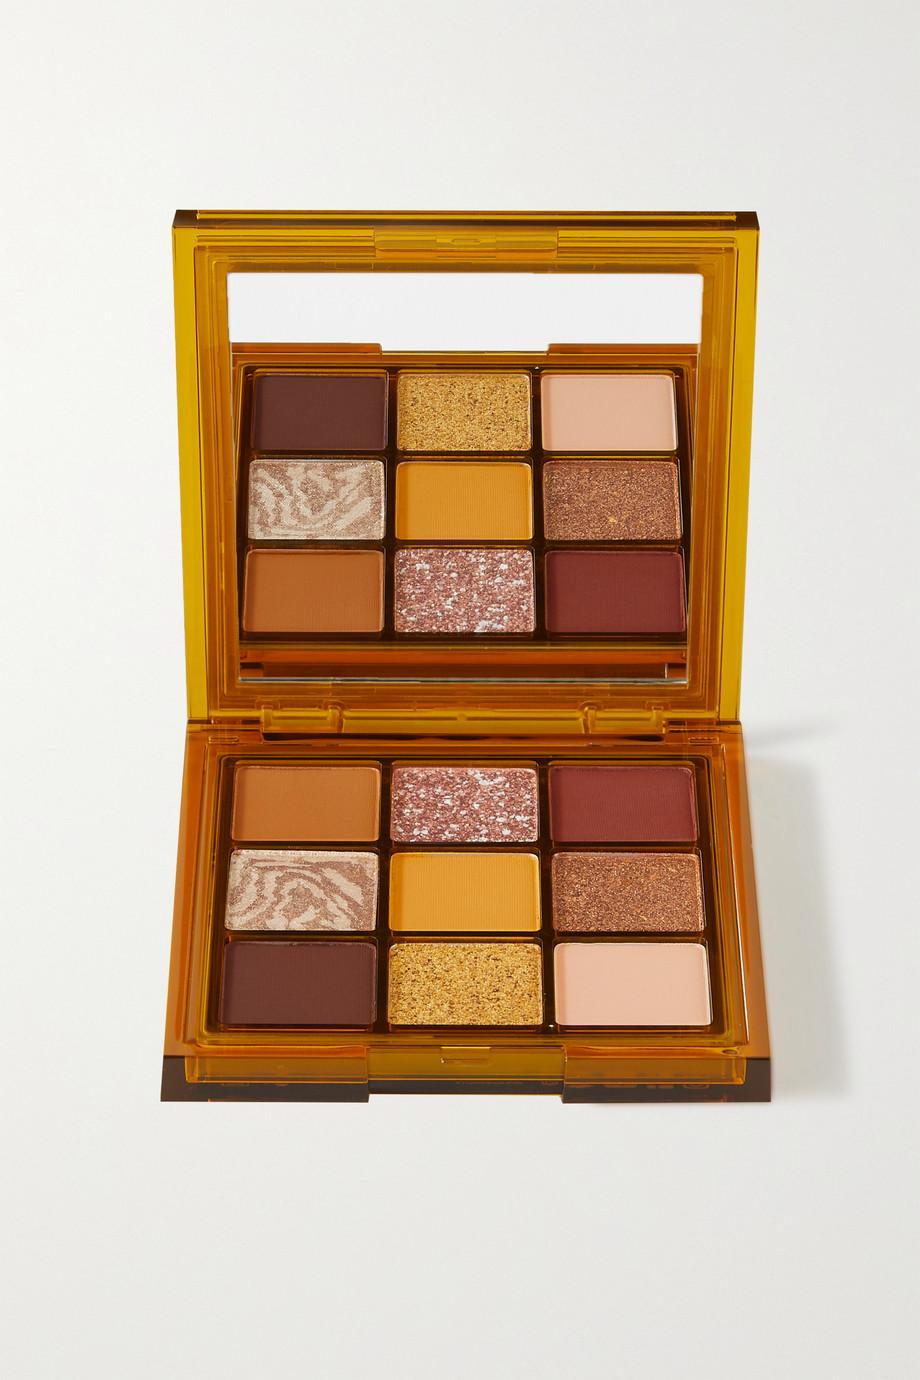 Huda Beauty Brown Obsessions Eyeshadow Palette - Toffee